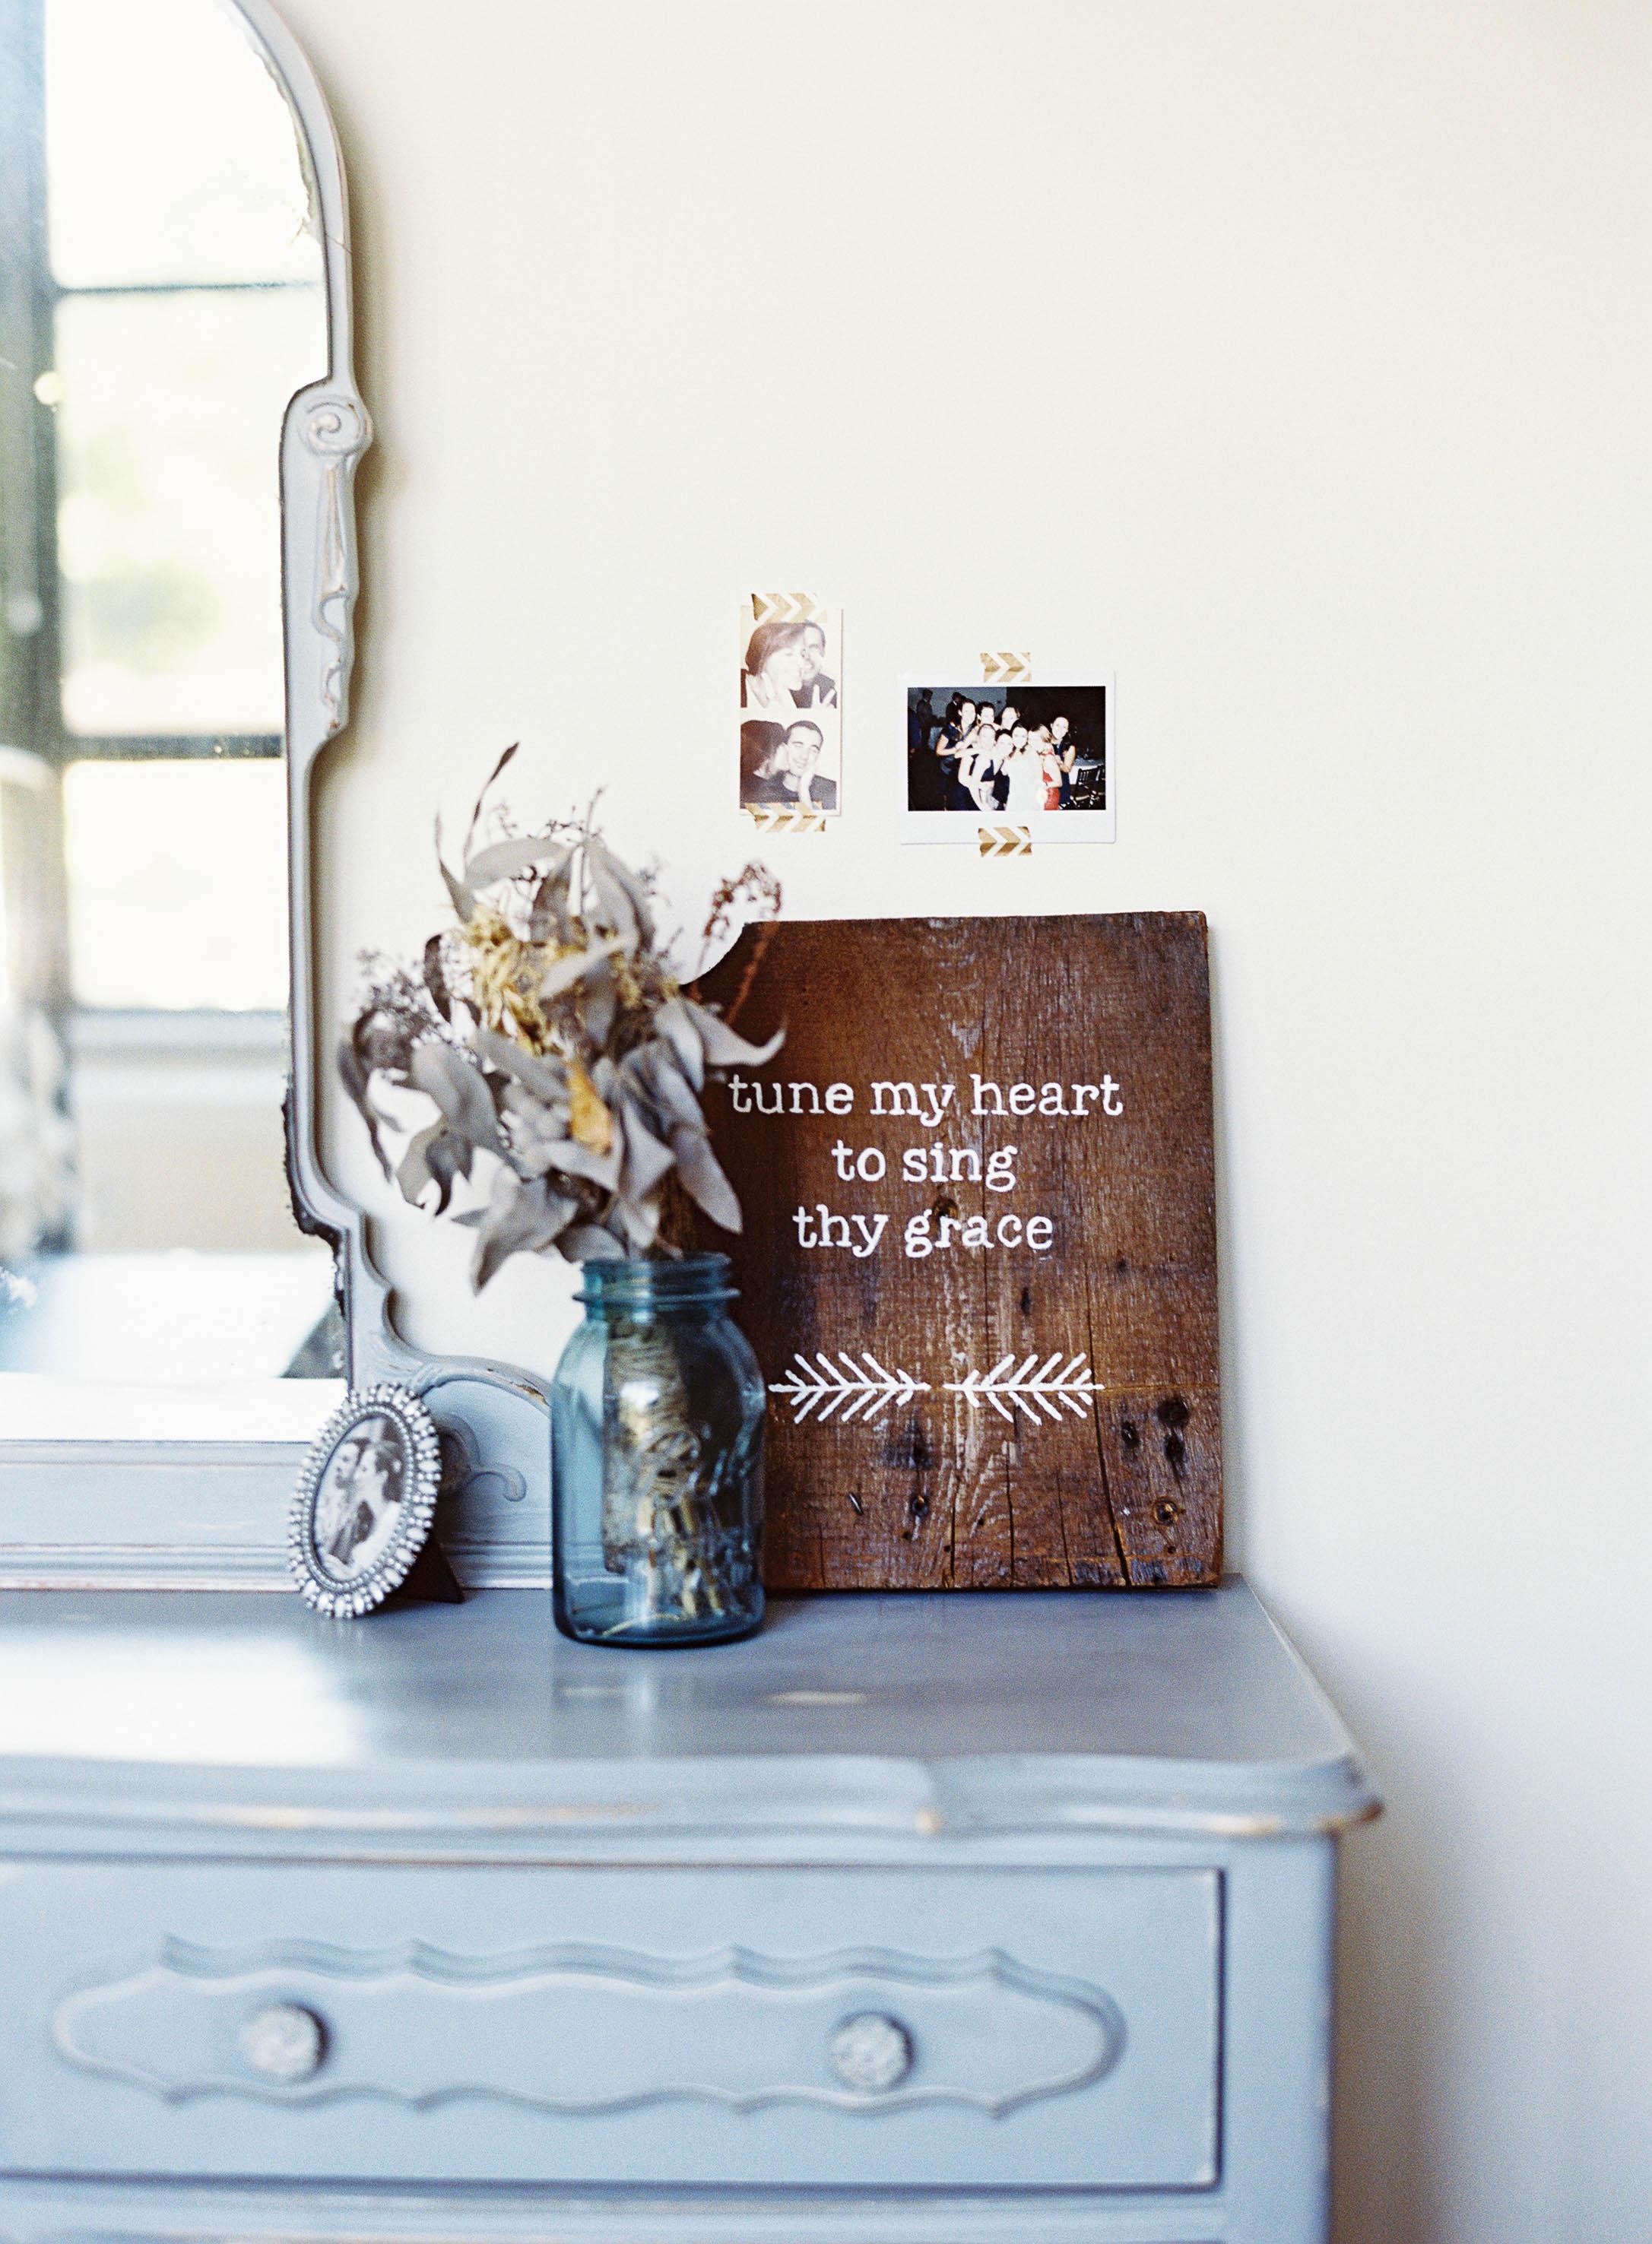 Meghan Mehan Photography | Fine Art Film Wedding Photographer | California | San Francisco | Napa | Sonoma | Santa Barbara | Big Sur | Los Angeles | Destination Wedding Photographer 017.jpg